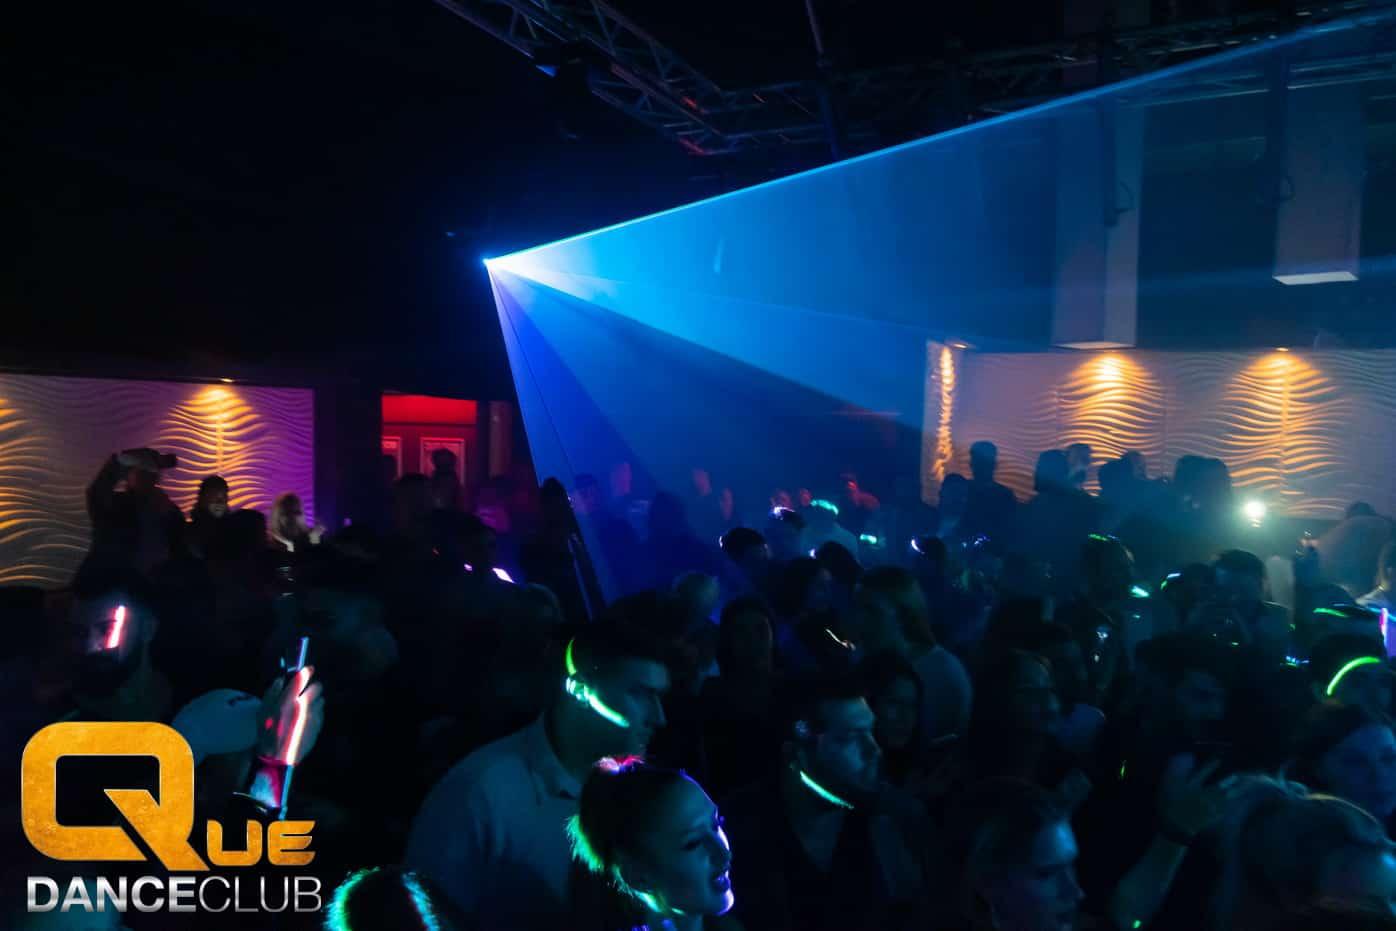 2018_12_08_Que_Danceclub_Paparazzo_Night_Ardian_Bujupi_Live_Nightlife_Scene_Timo_046